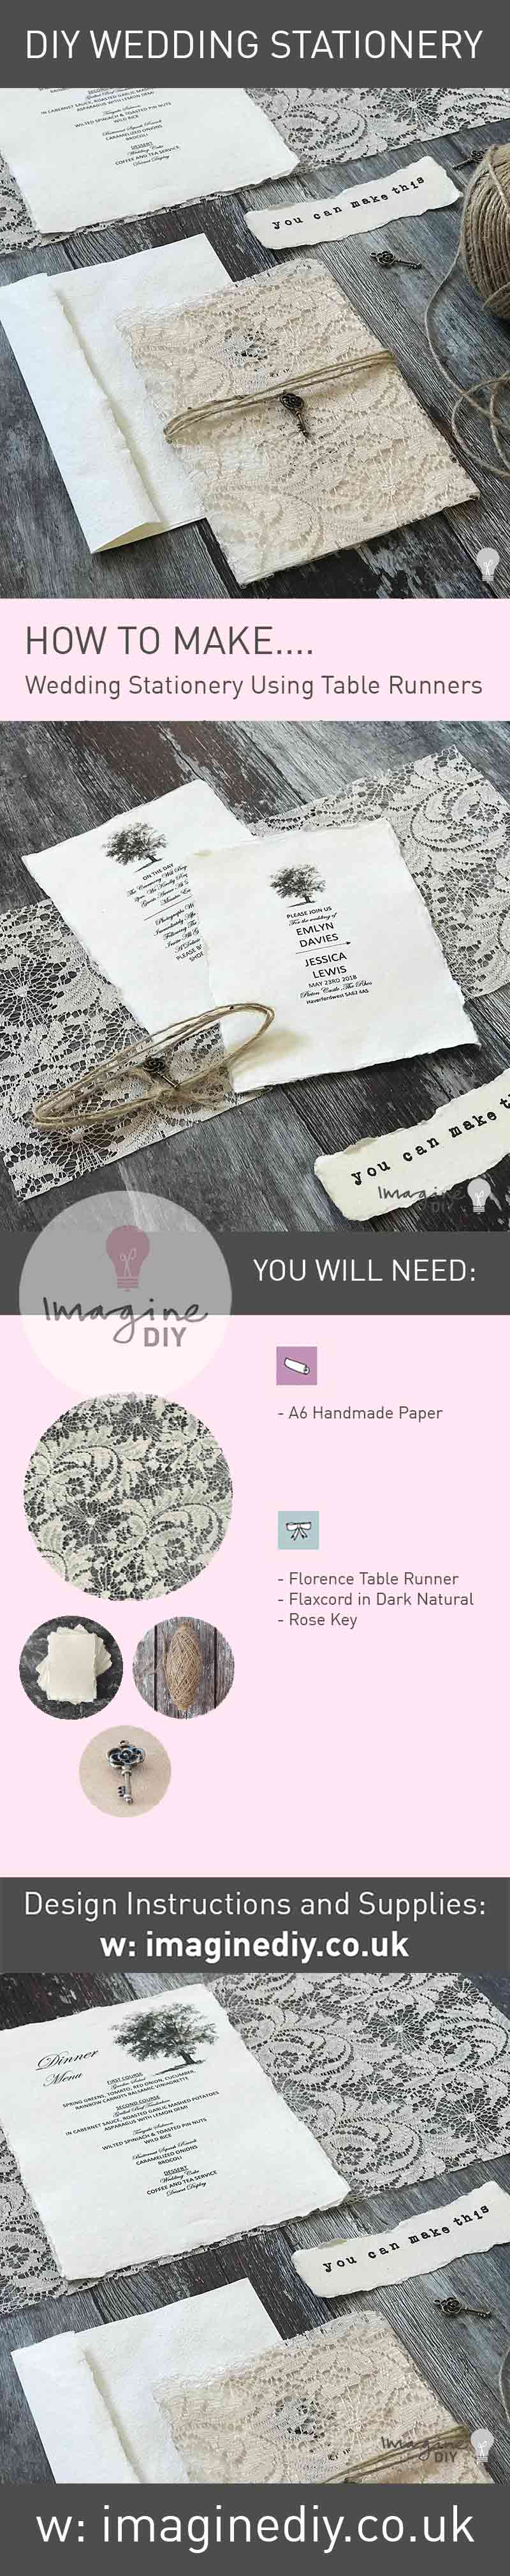 how to make easy DIY wedding stationery using fabric.  Rustic wedding invitations and wedding stationery to make yourself.  DIY lace wedding ideas.